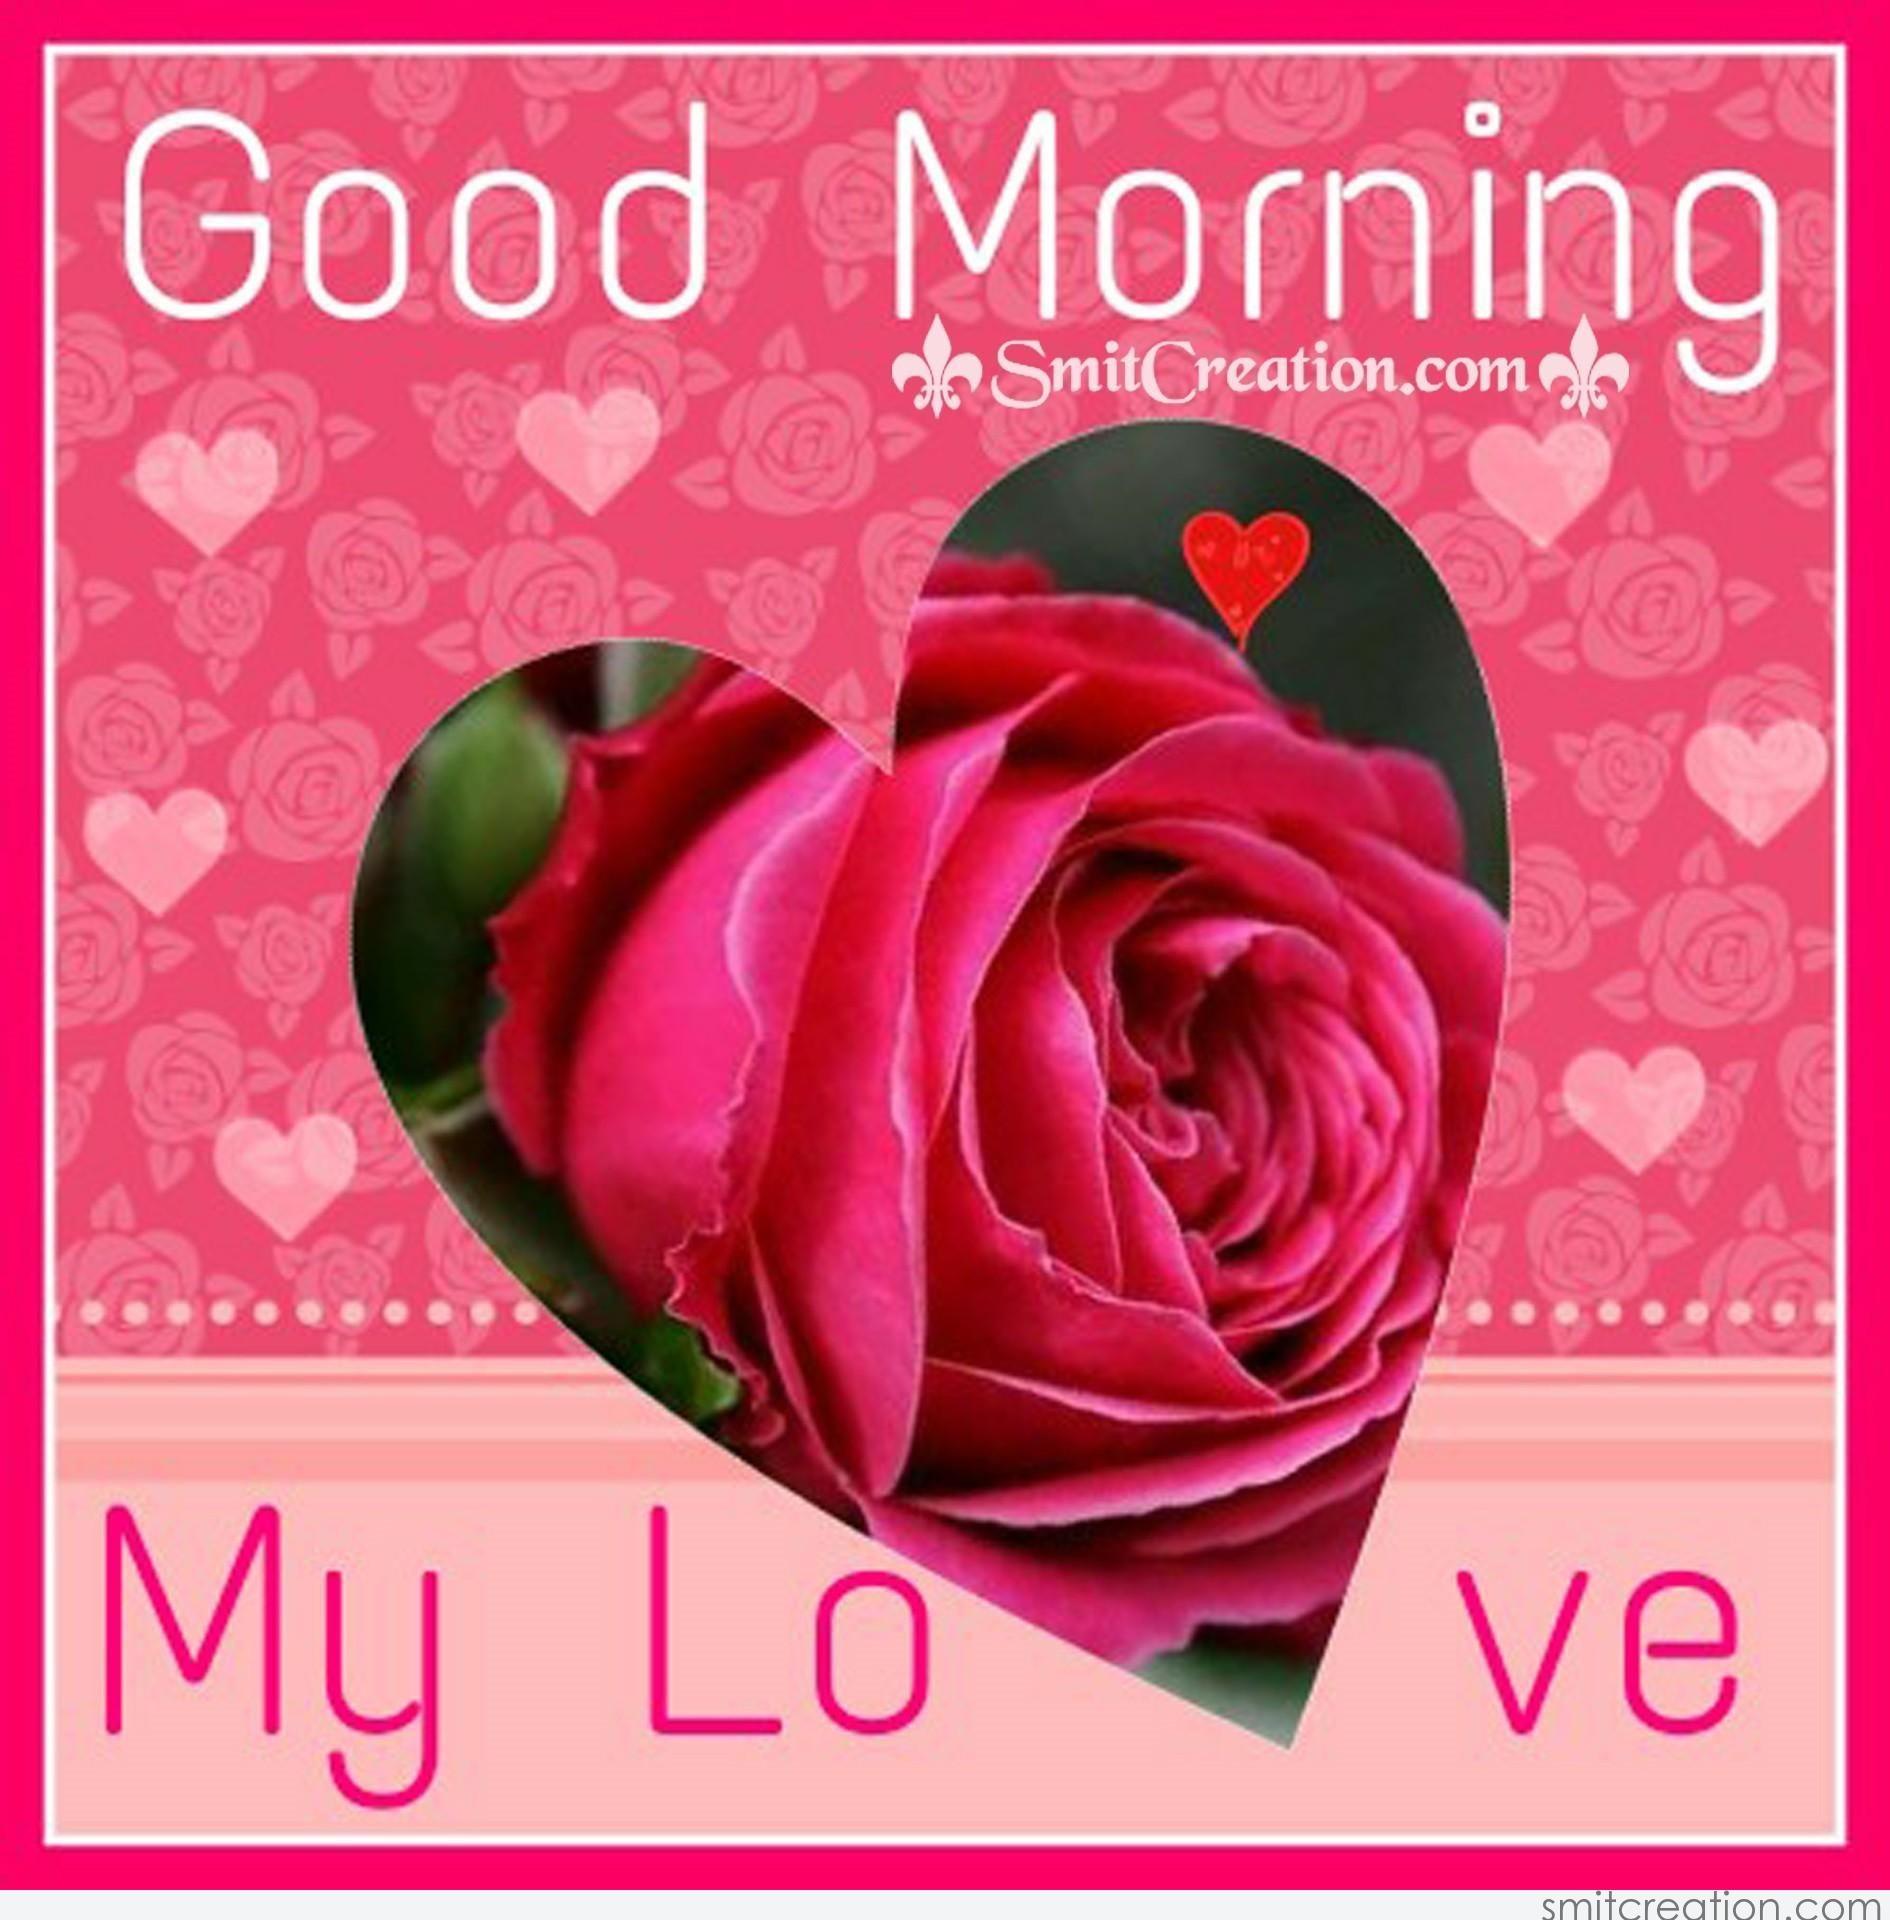 Good Morning Quotes My Wife: Good Morning My Love - SmitCreation.com